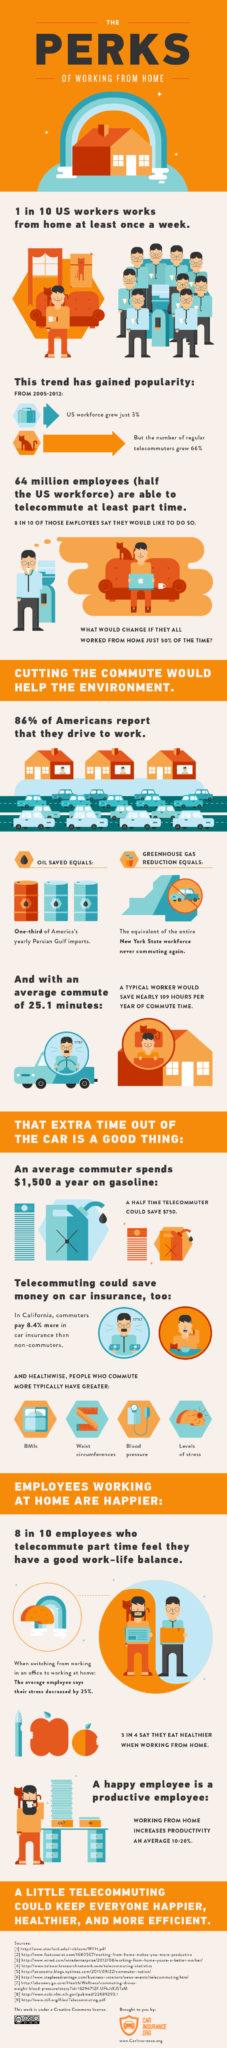 Telecommuter Infographic